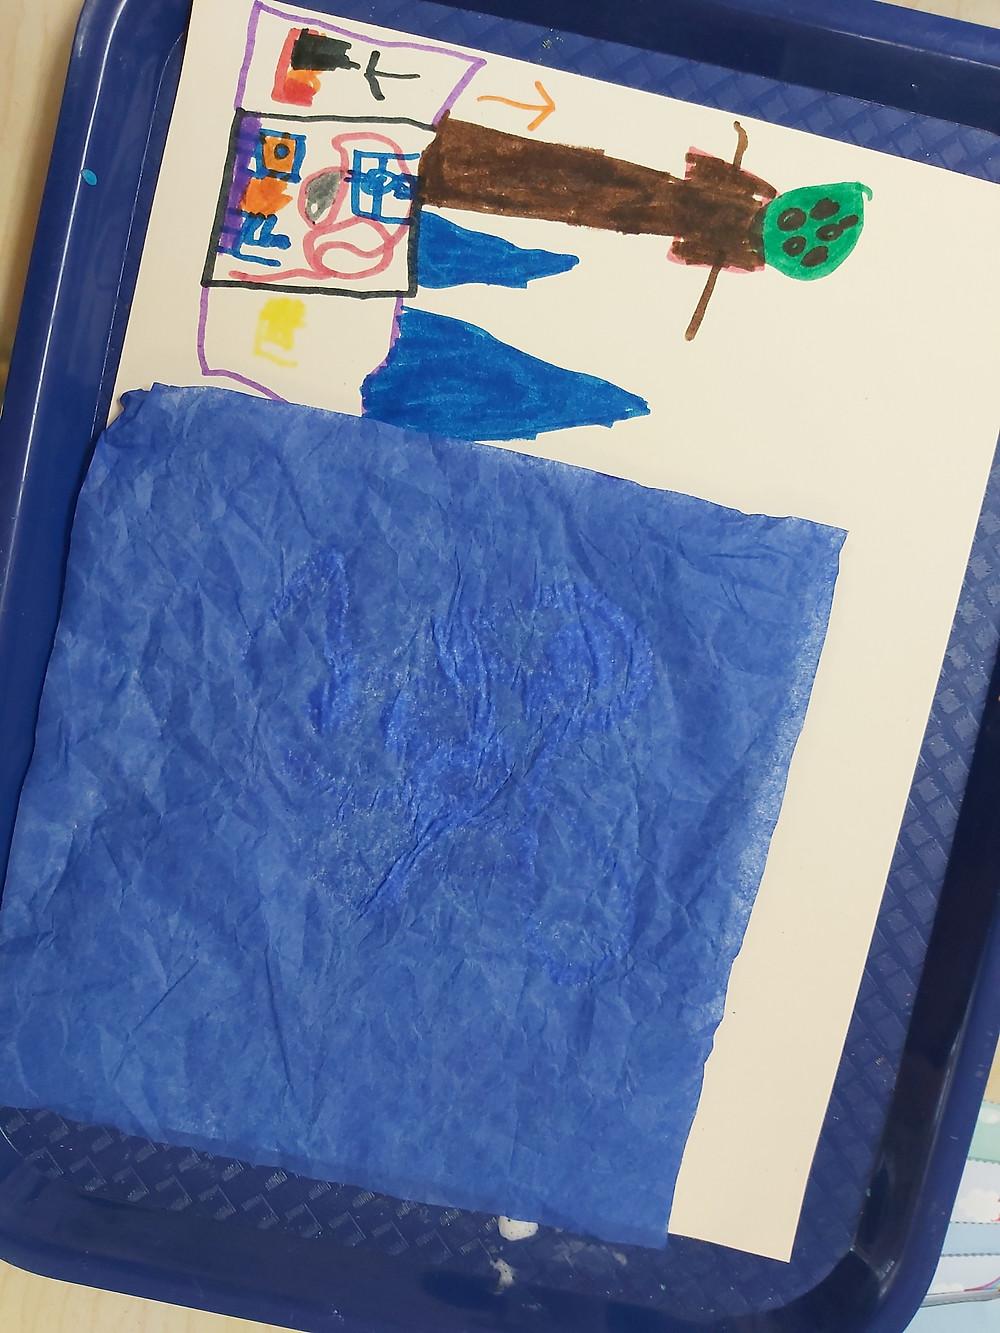 preschooler's river collage artwork